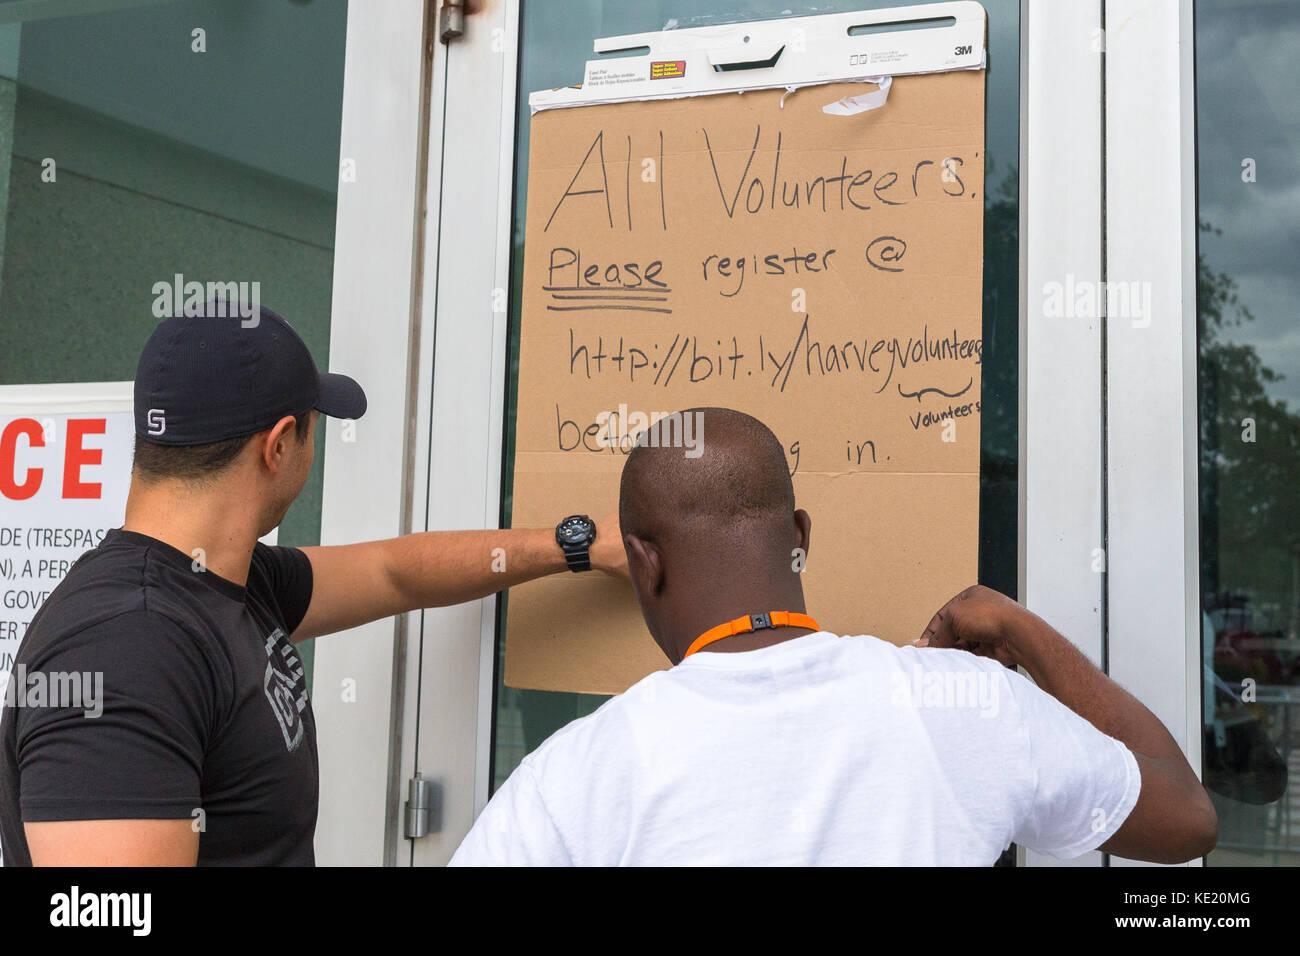 Emergency shelter is seeking volunteers to help with relief efforts - Stock Image